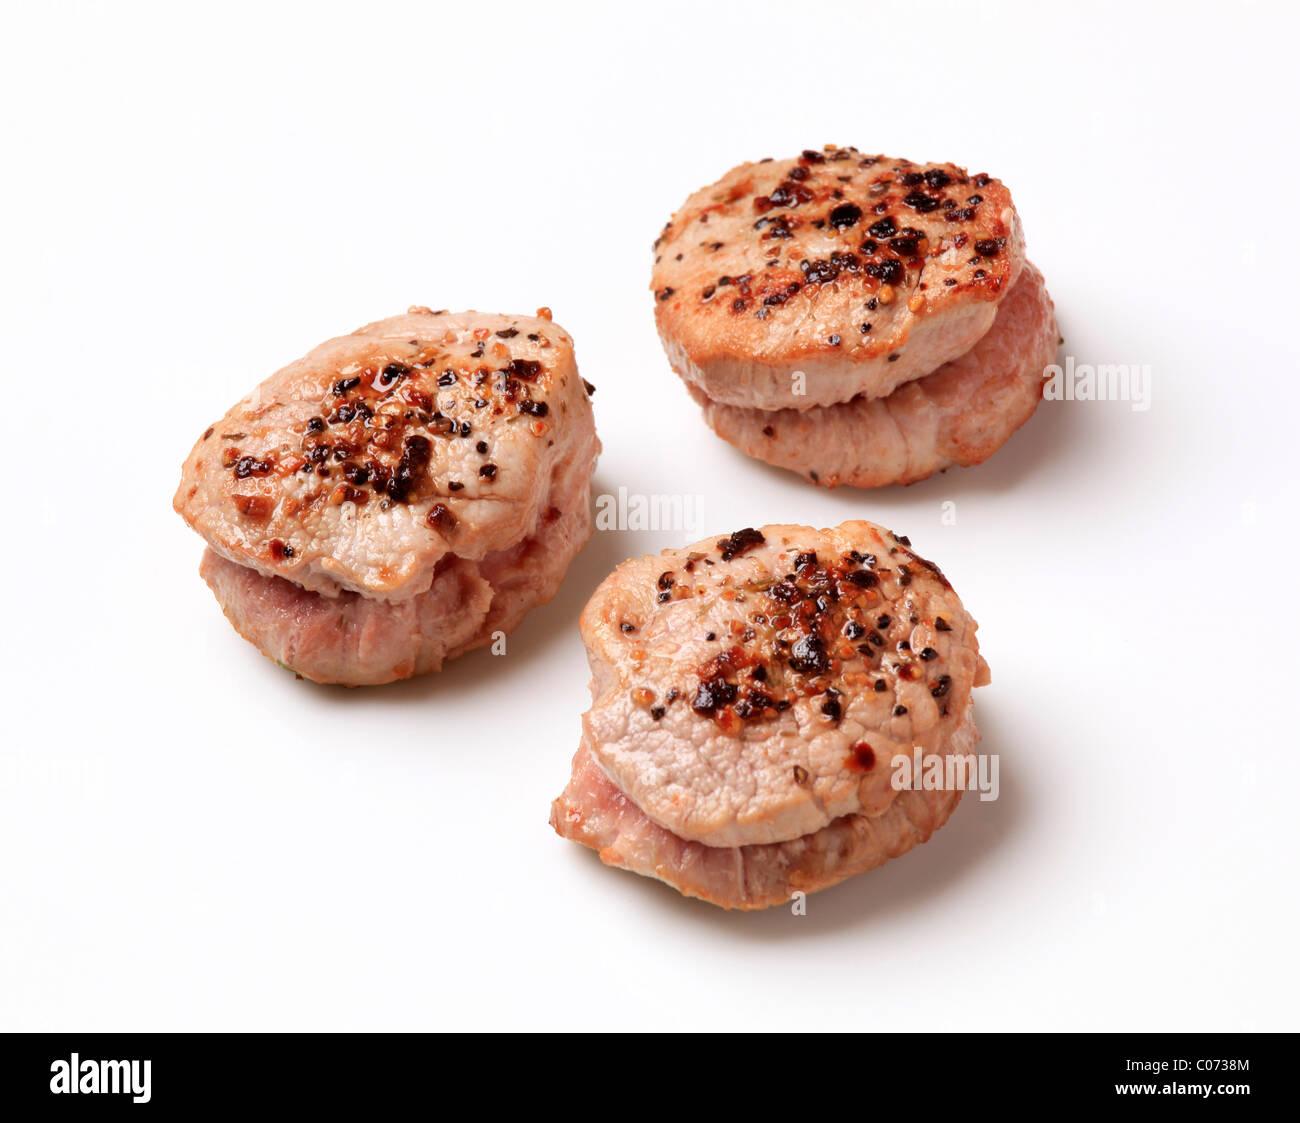 Pan Roasted Pork Tenderloin Medallions Seasoned On Top Stock Photo Alamy